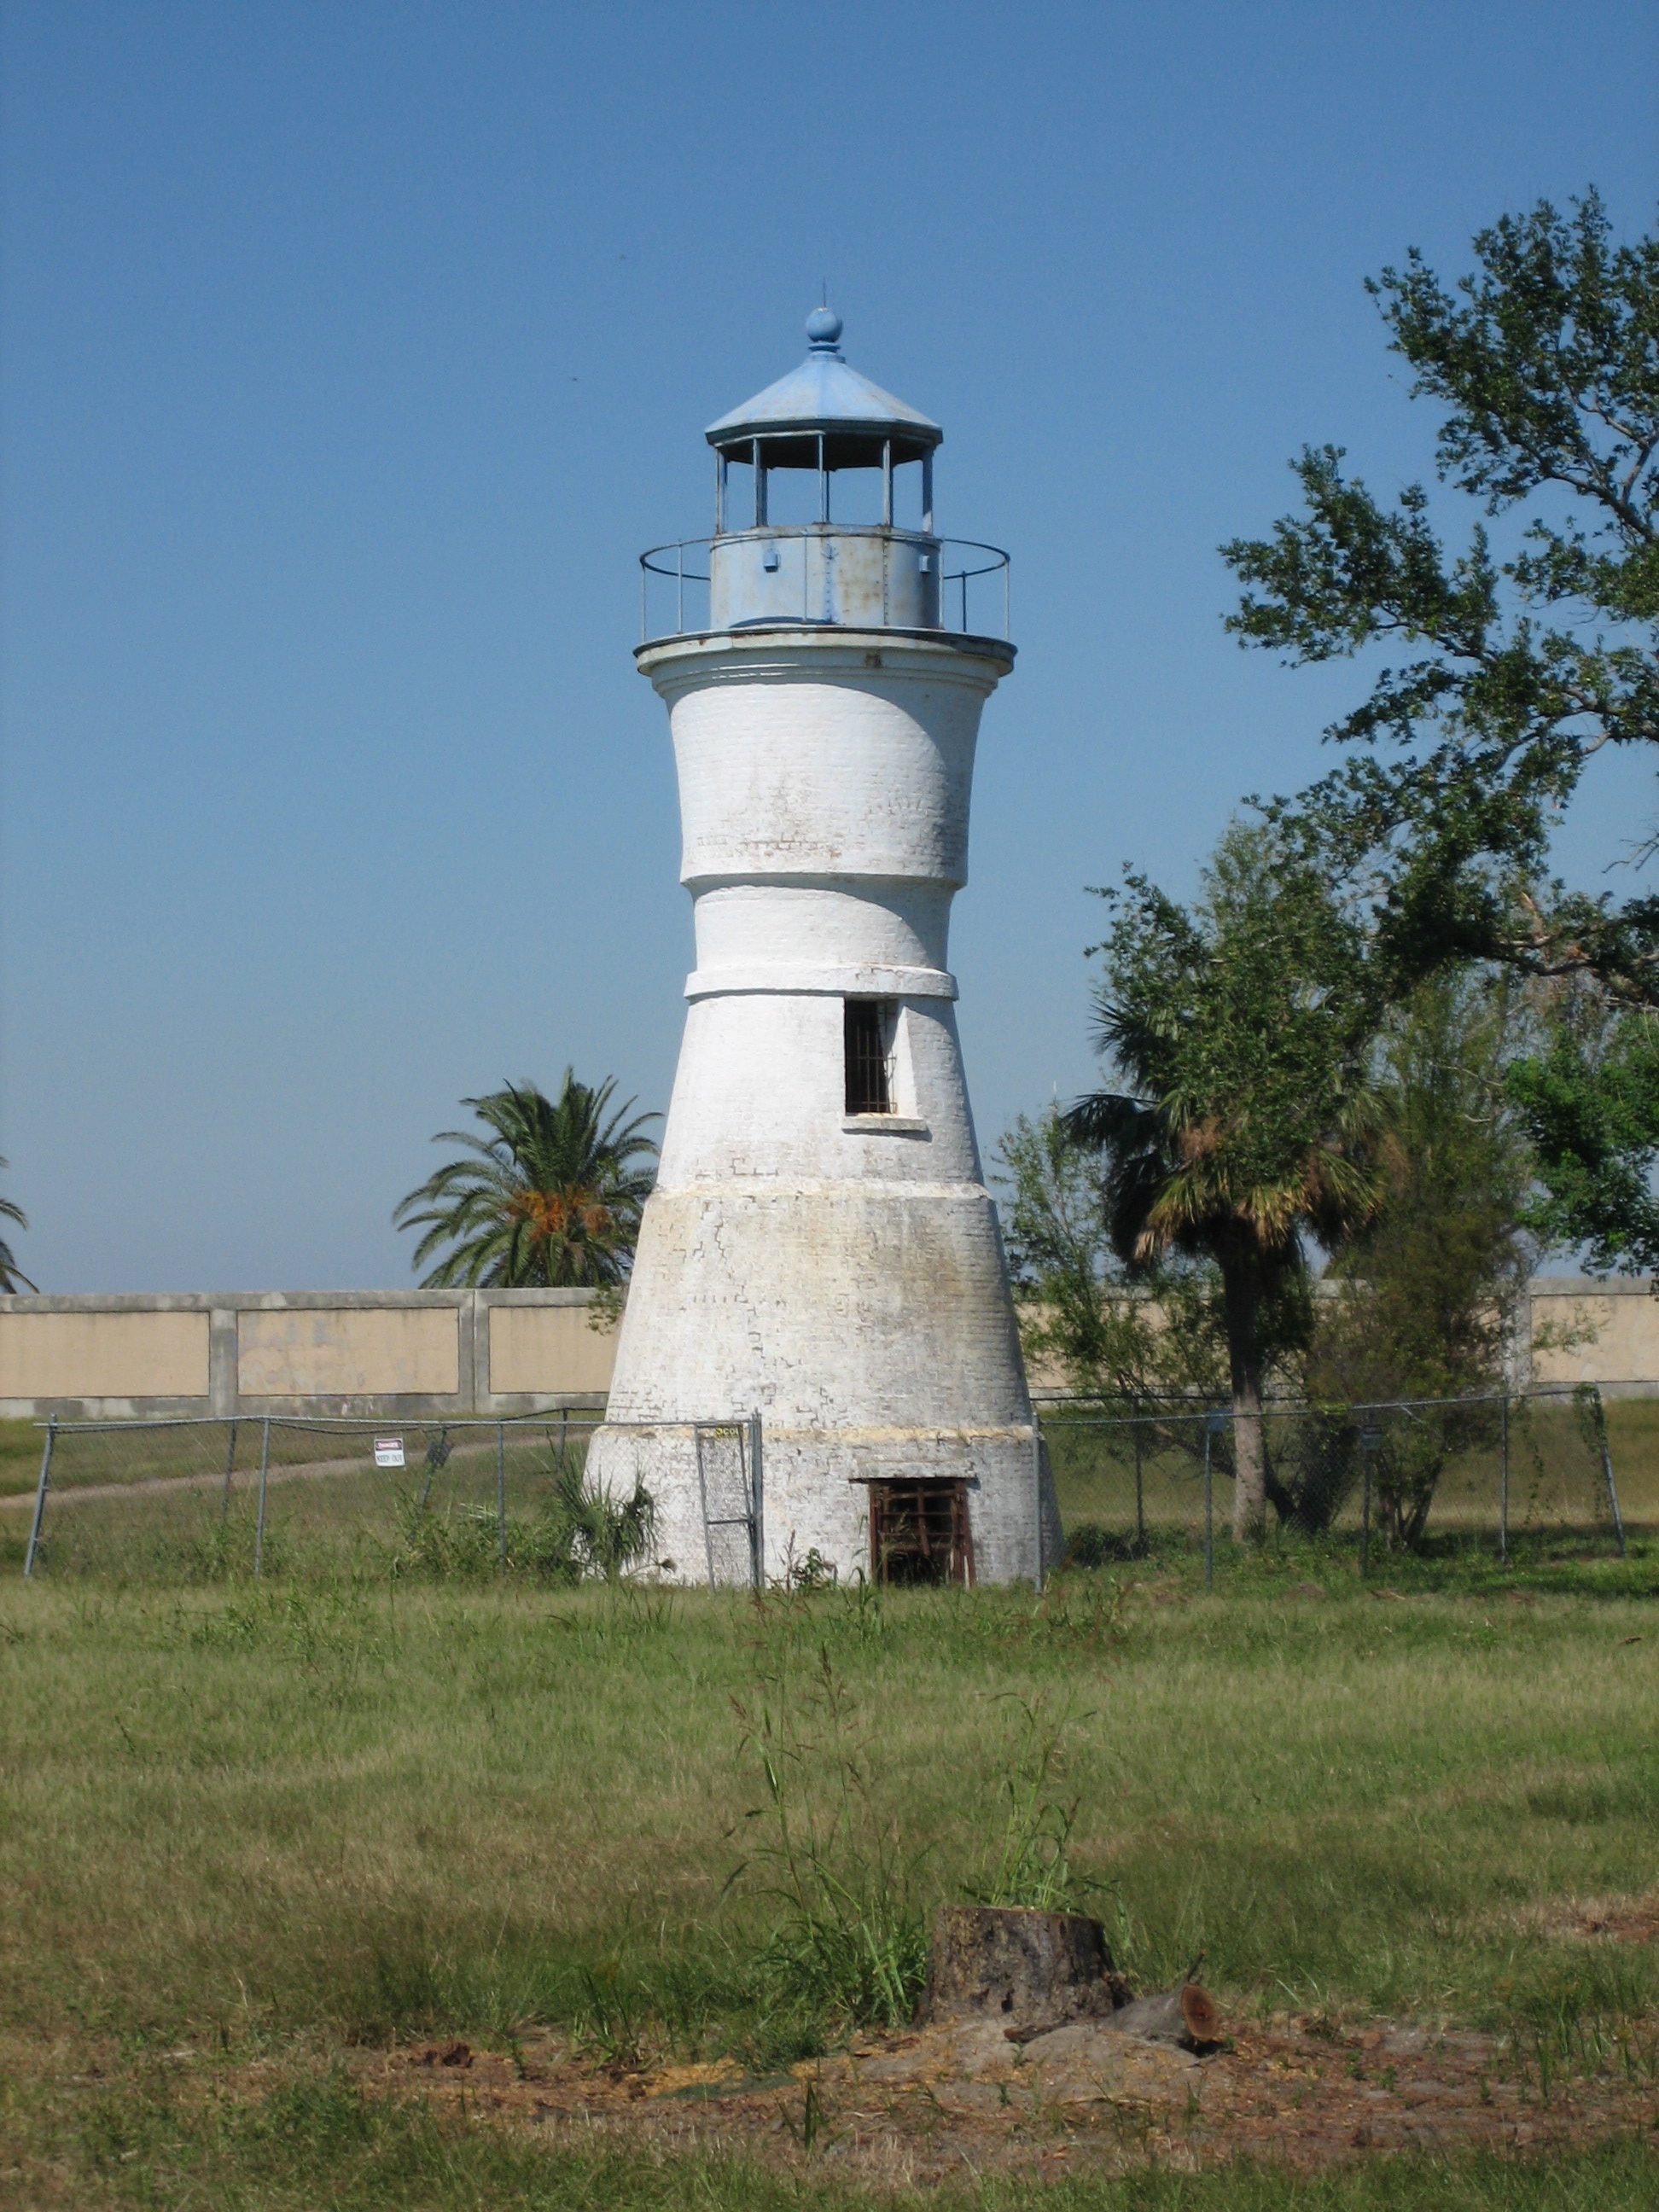 Land-locked lighthouse New Orleans